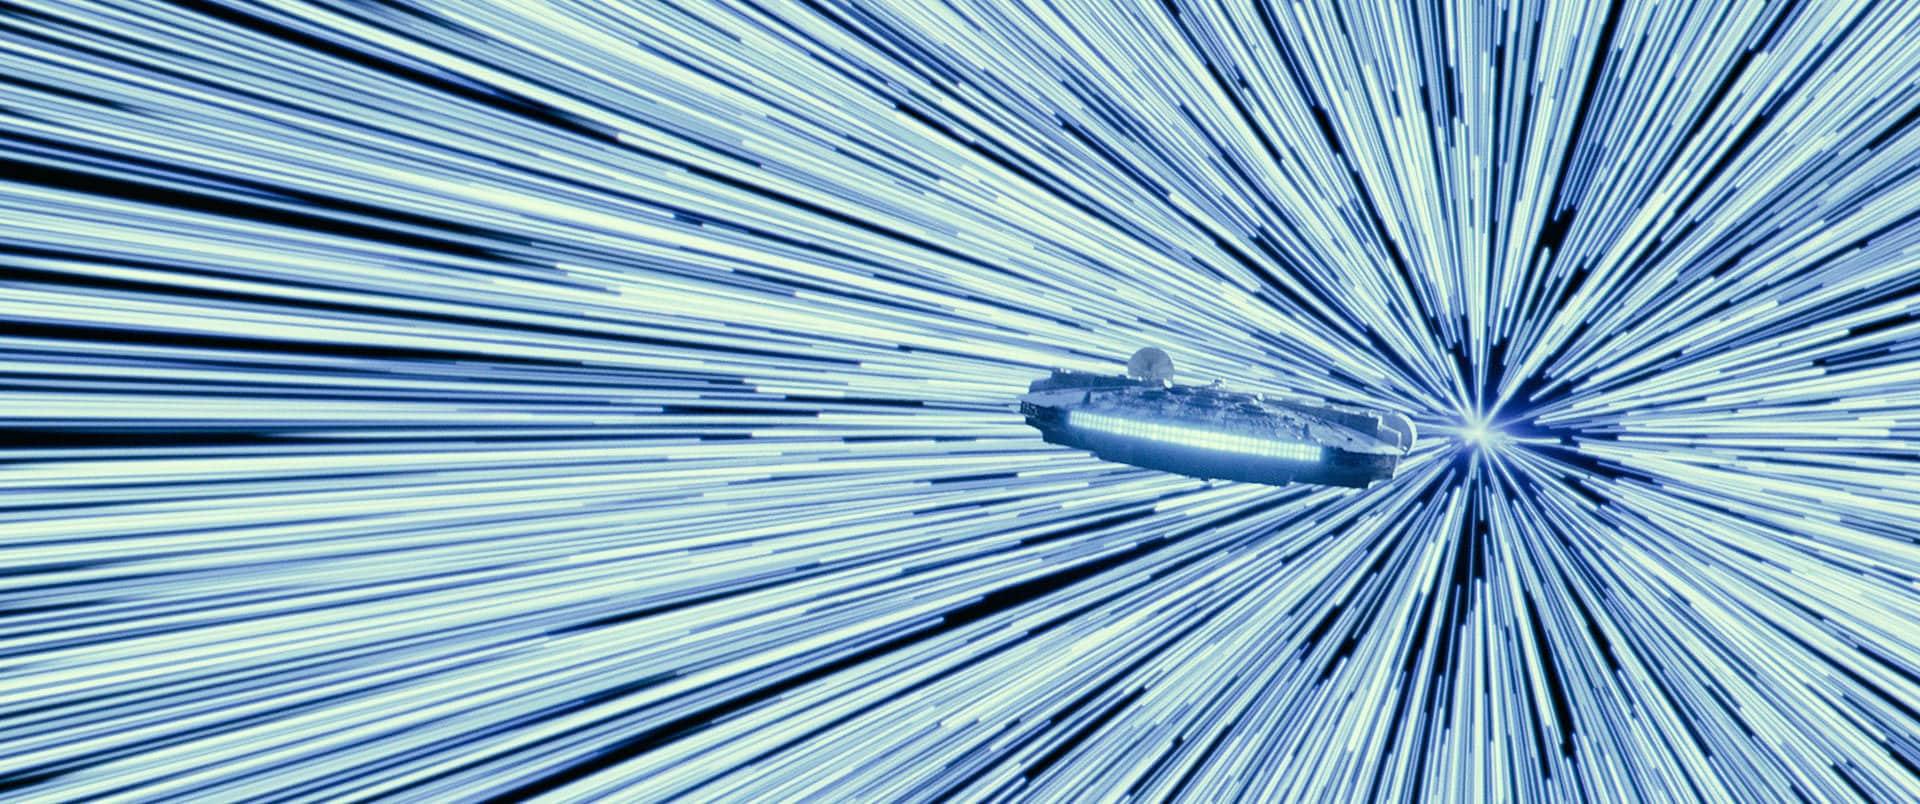 Star Wars: Rise of the Skywalker